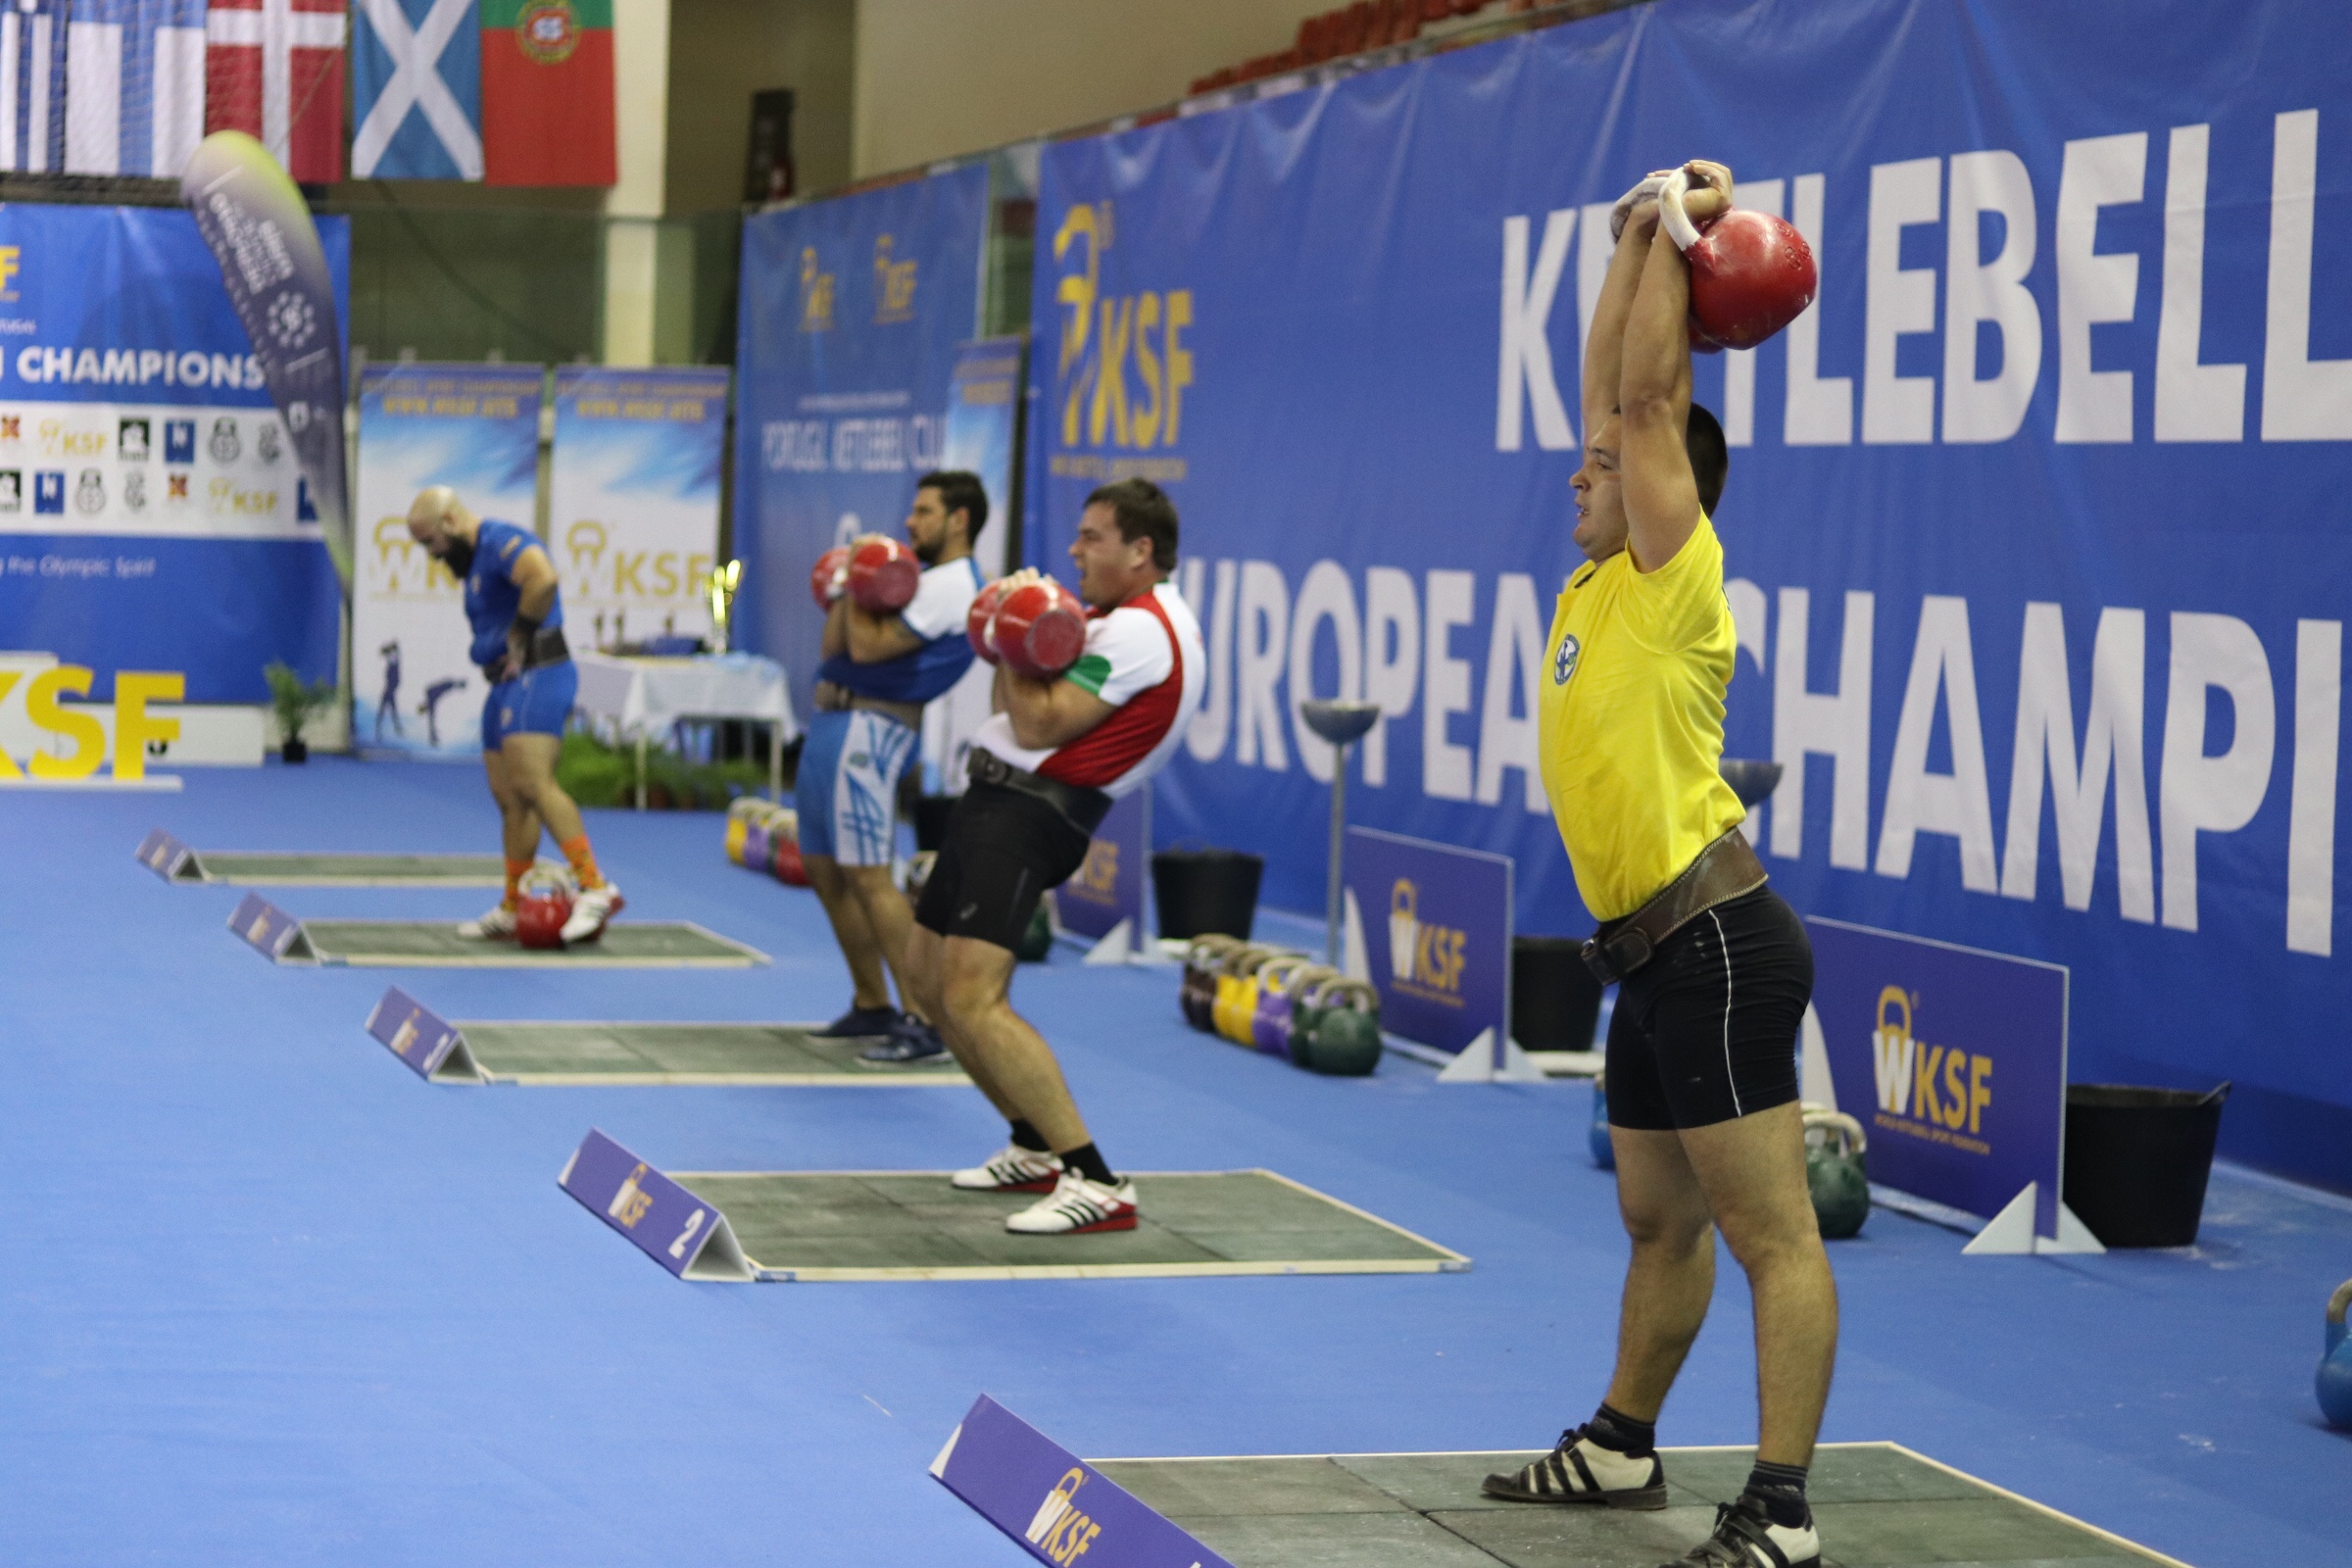 Kettlebell Wettkampf: HIer die Europameisterschaft 2018 in Porto / Portugal.